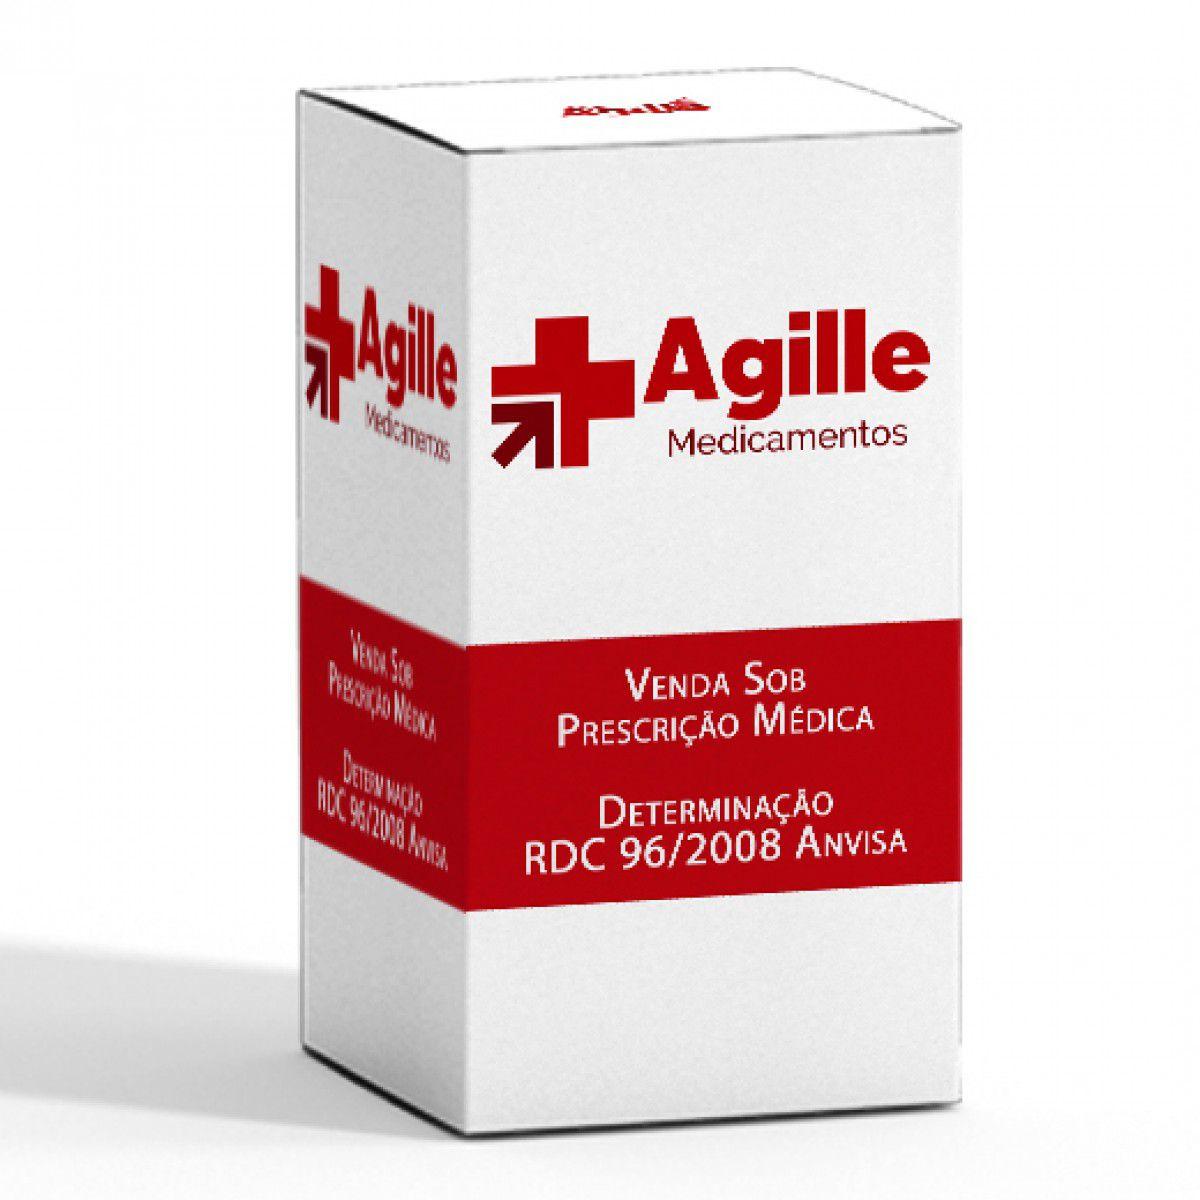 IRESSA 250mg cx 30 comp rev  - Agille Speciality